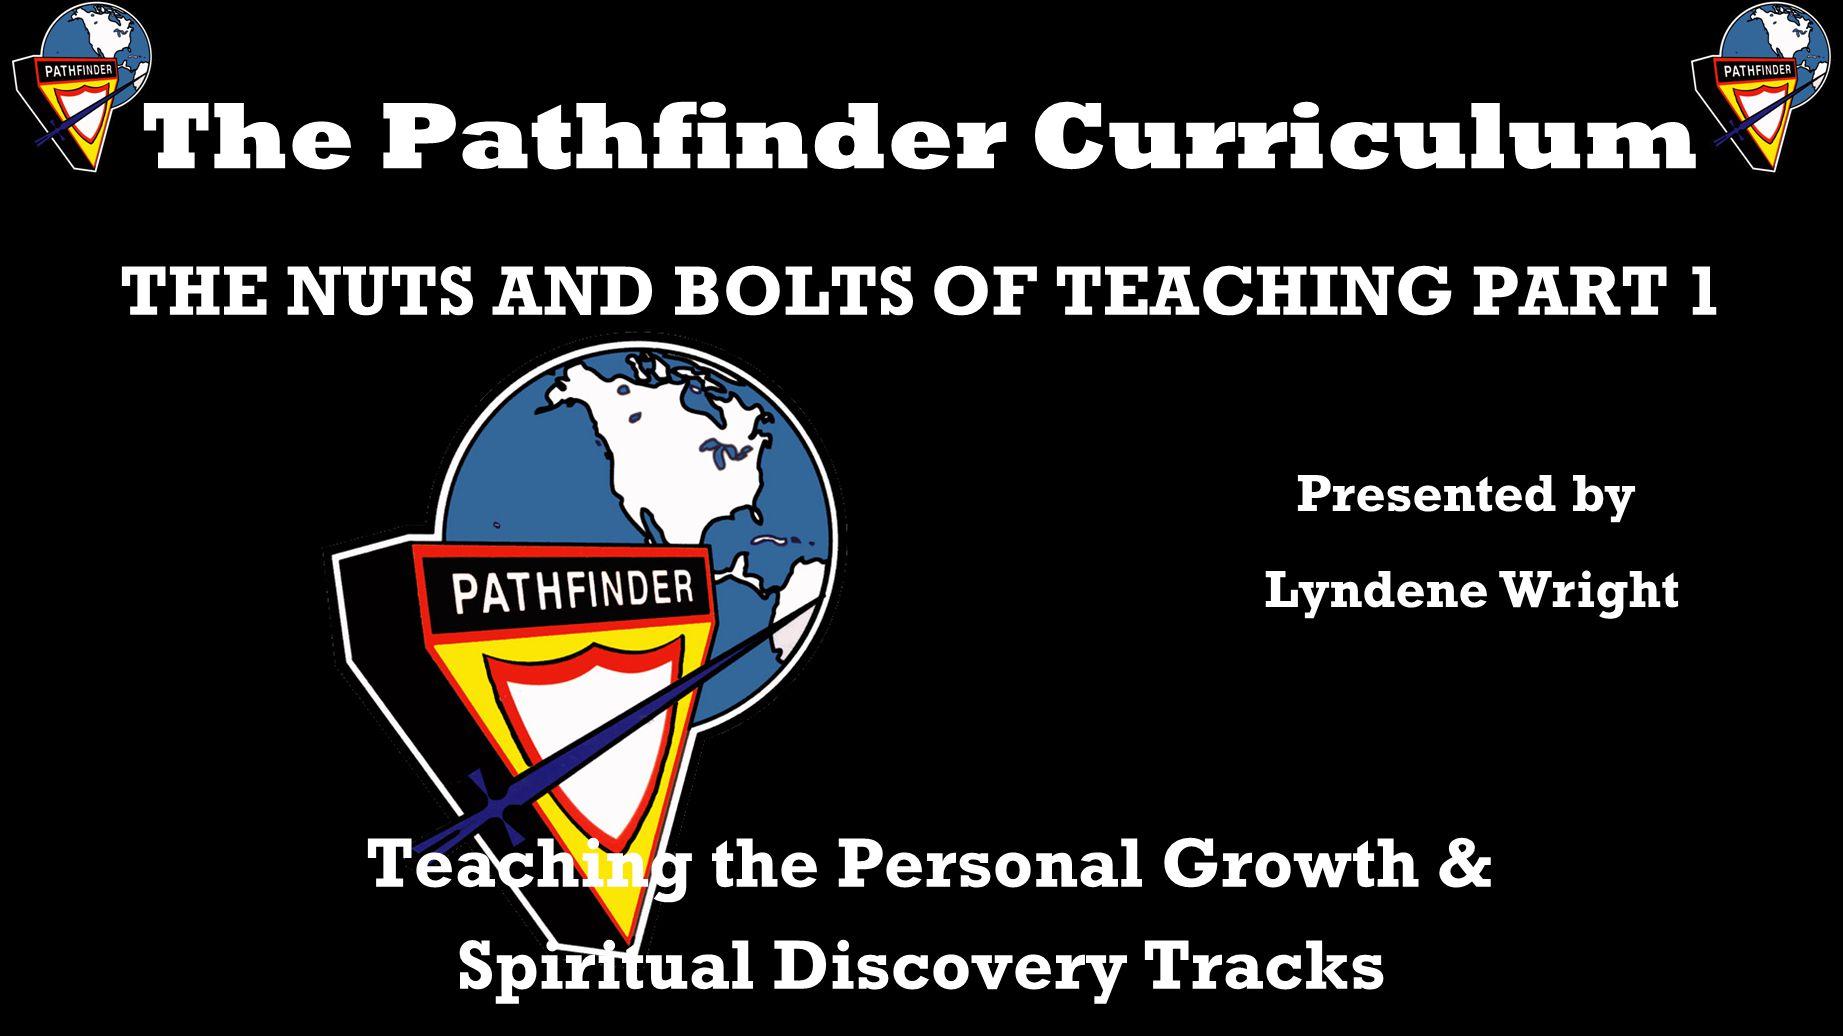 worksheet Sda Pathfinder Honors Worksheets the pathfinder curriculum ppt video online download curriculum